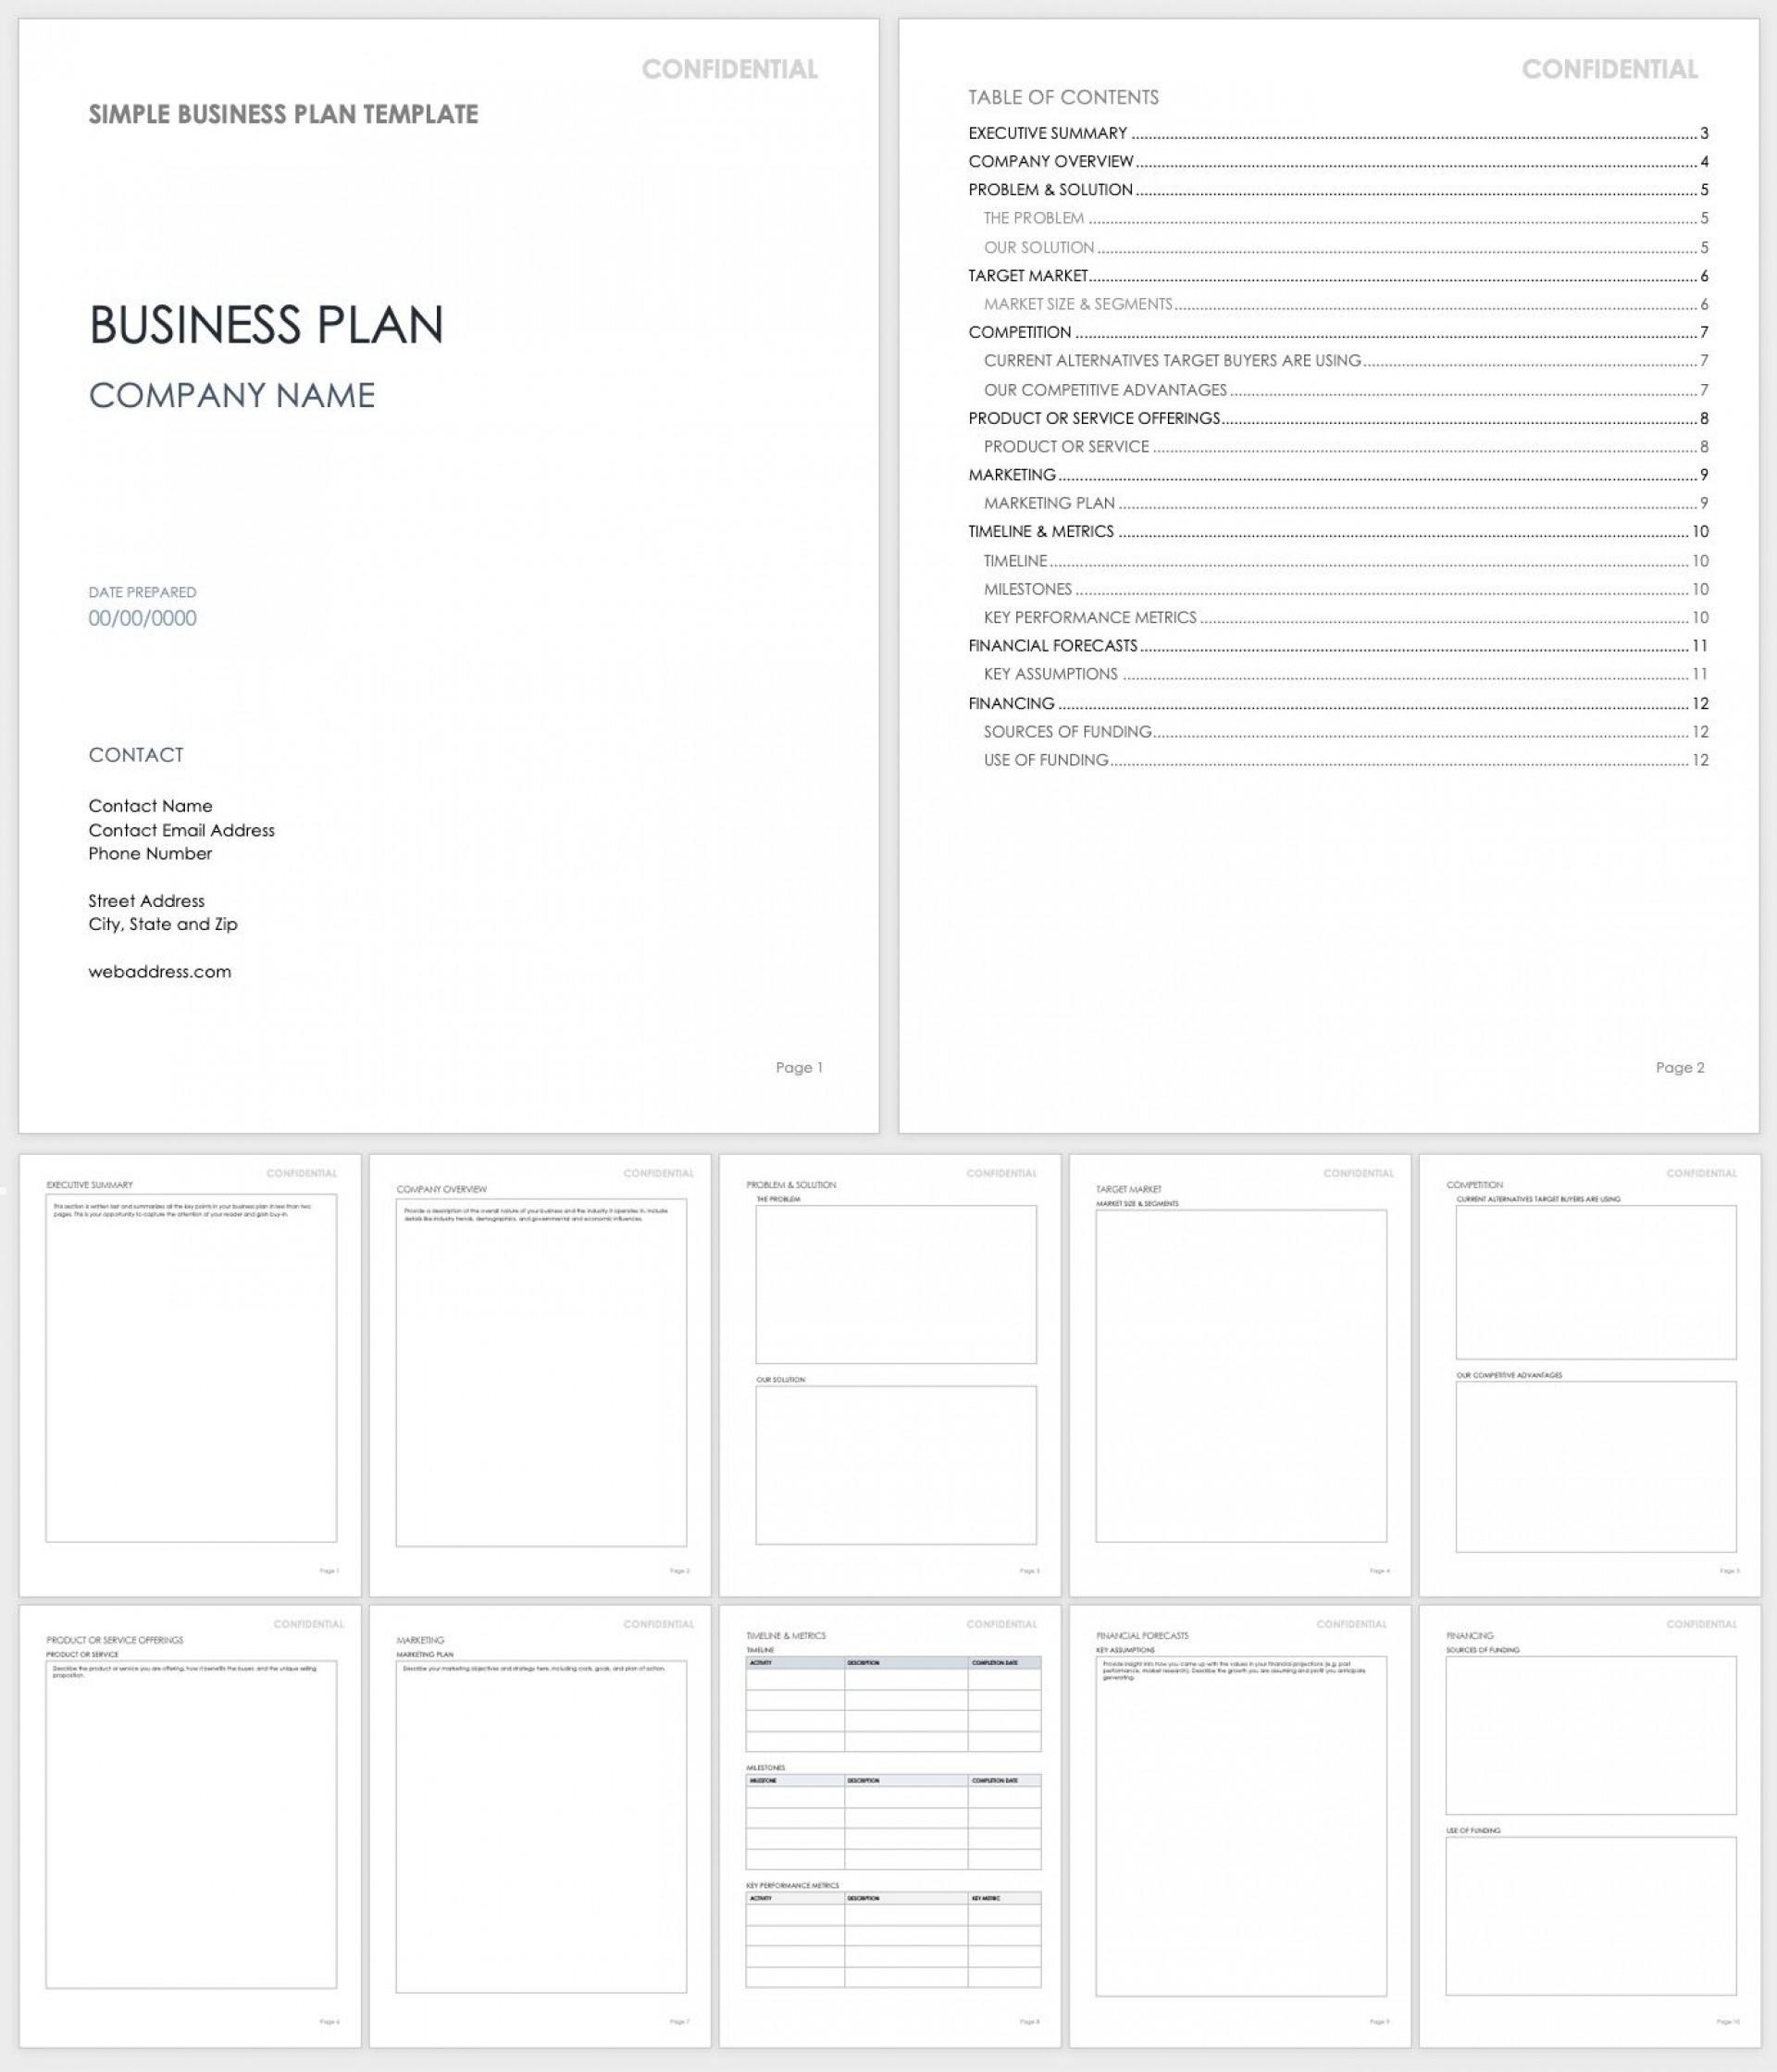 005 Impressive Basic Busines Plan Template Image  Templates Simple Uk Free Restaurant Sample Pdf Word1920